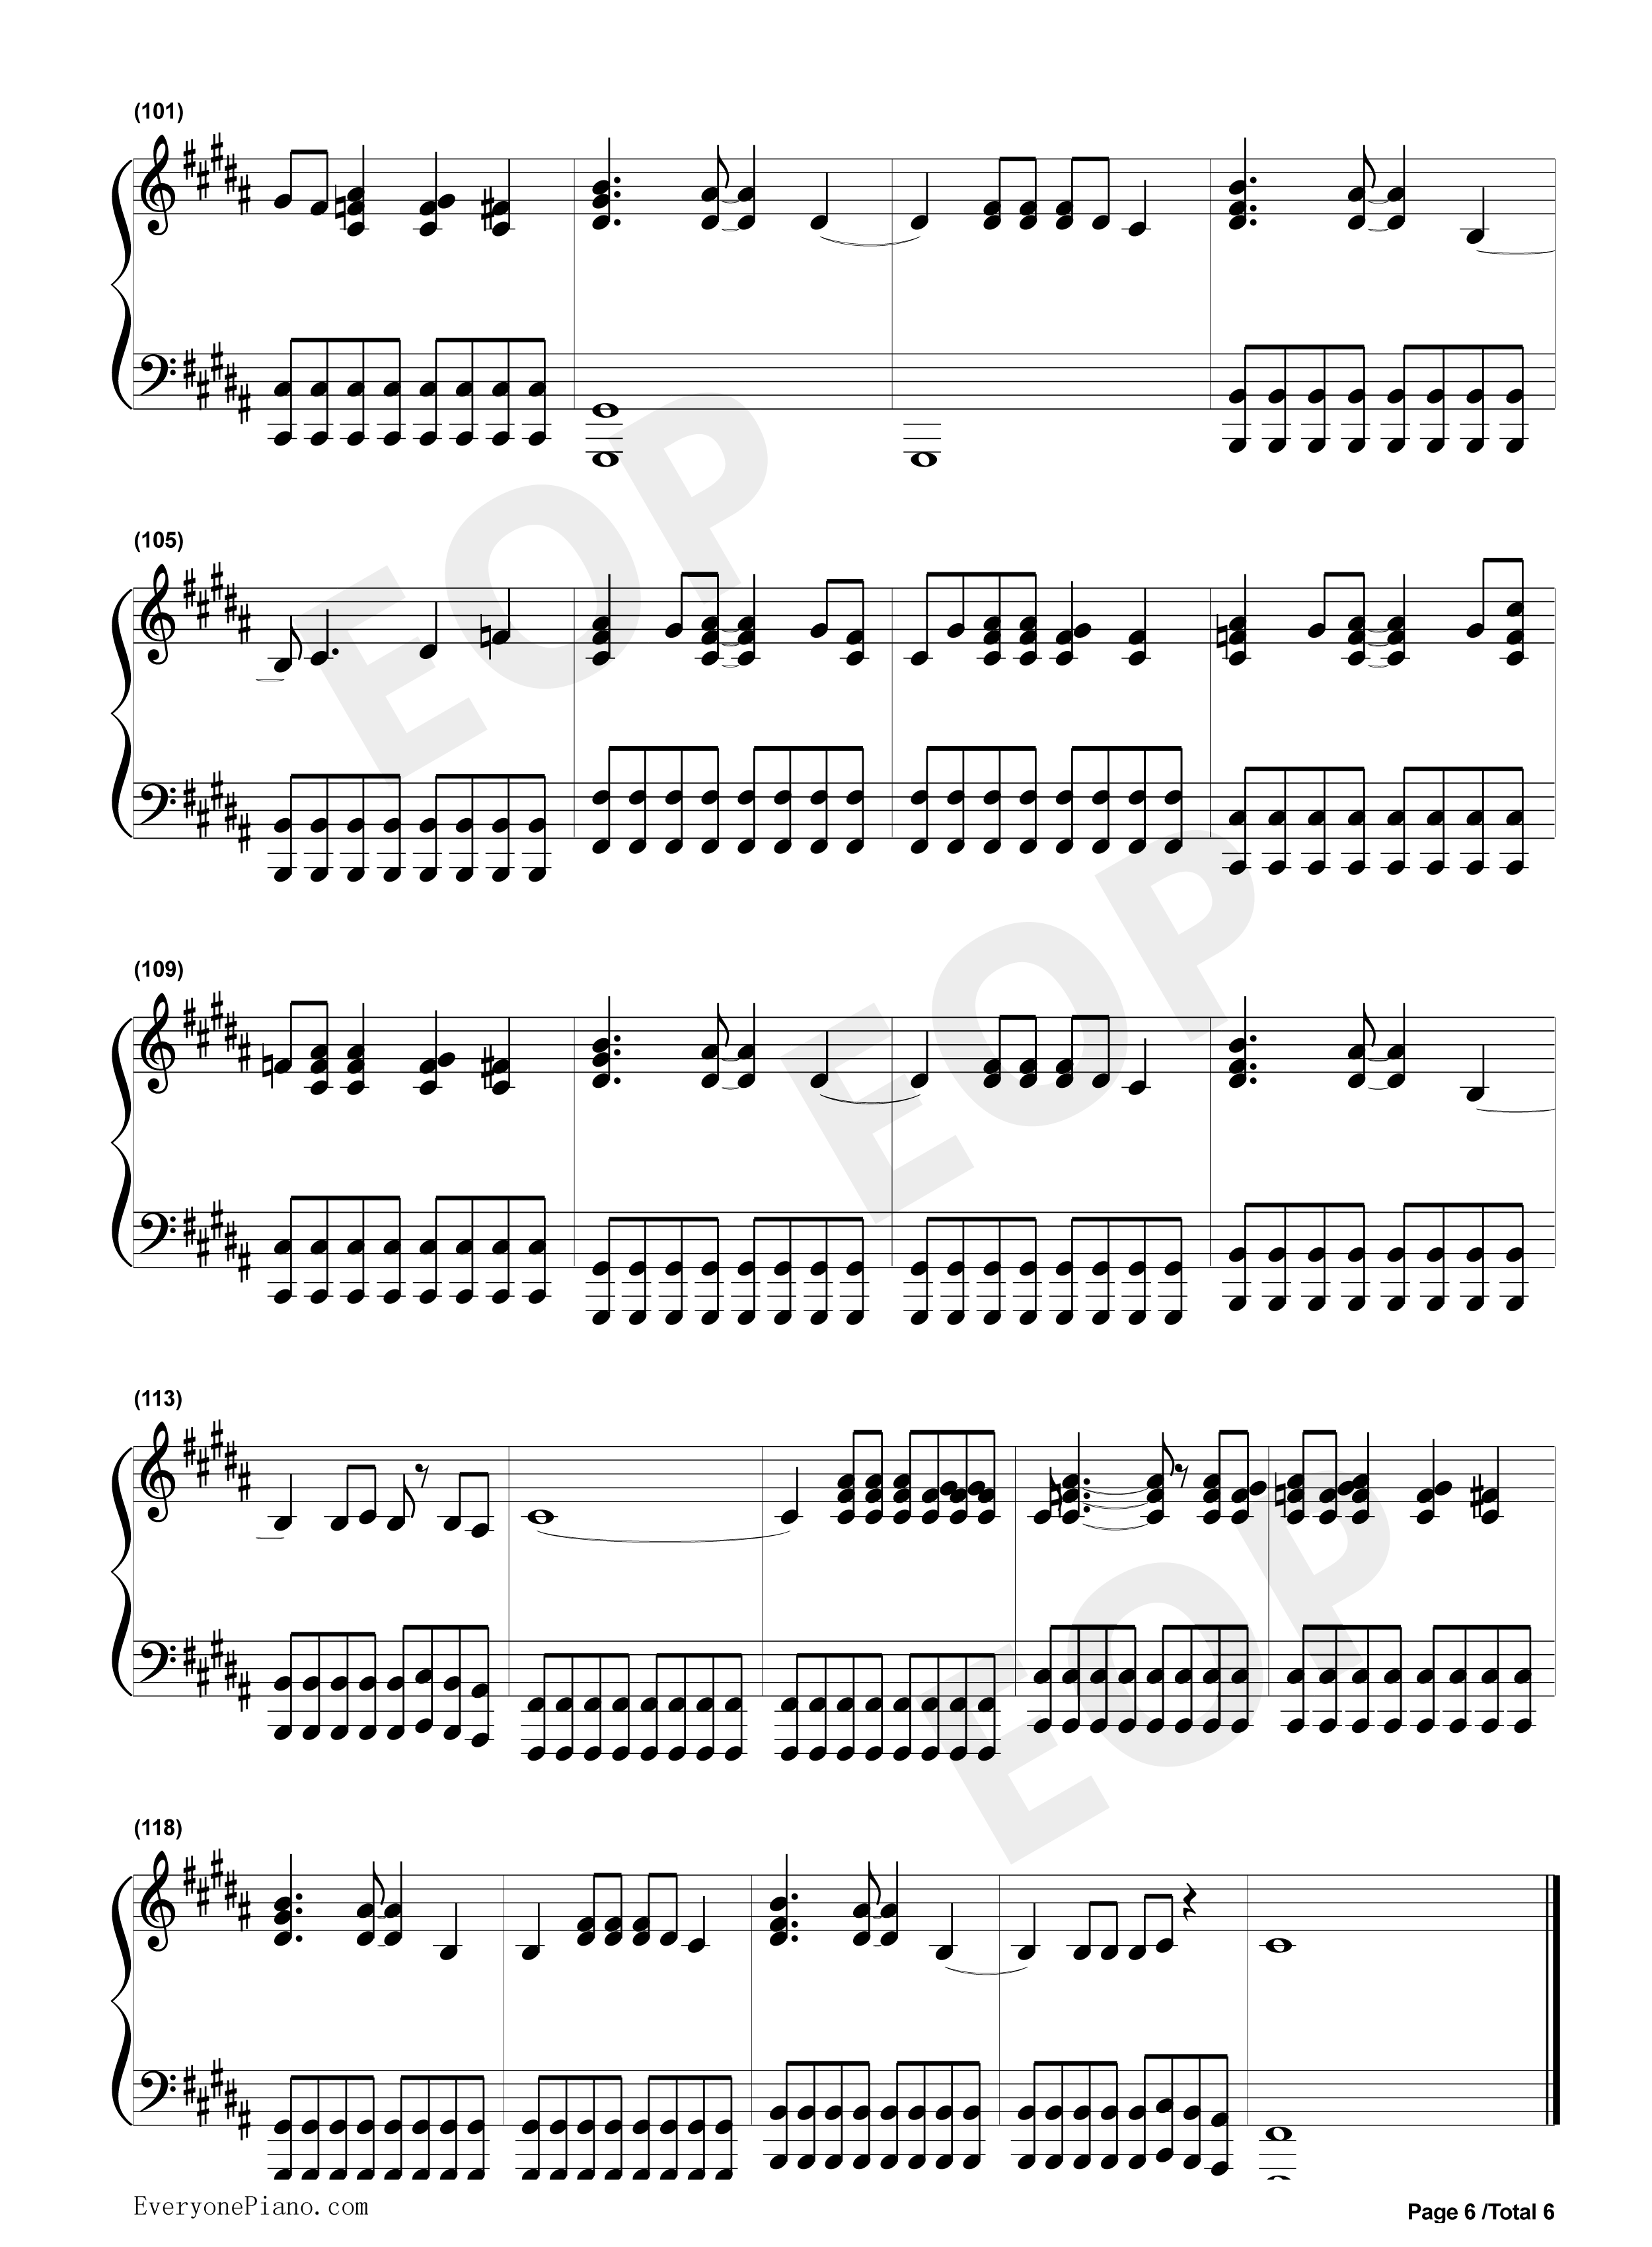 alwayswithme钢琴曲谱完整版